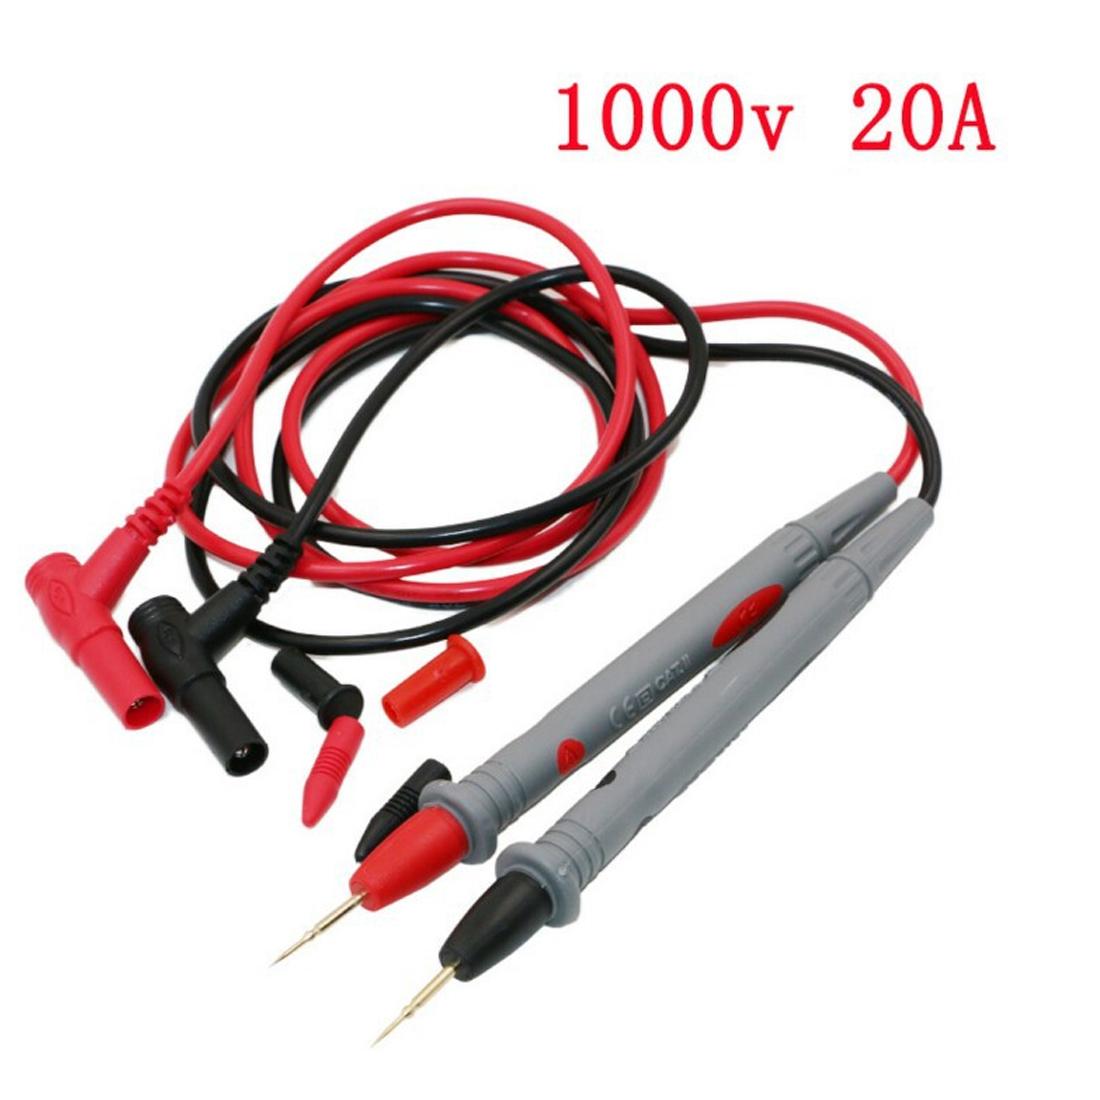 Portable Digital Multimeter Test Lead Probe Wire Pen Cable 1 Pair Universal  Digital Multi-sensor Test Pen 1000V 20A